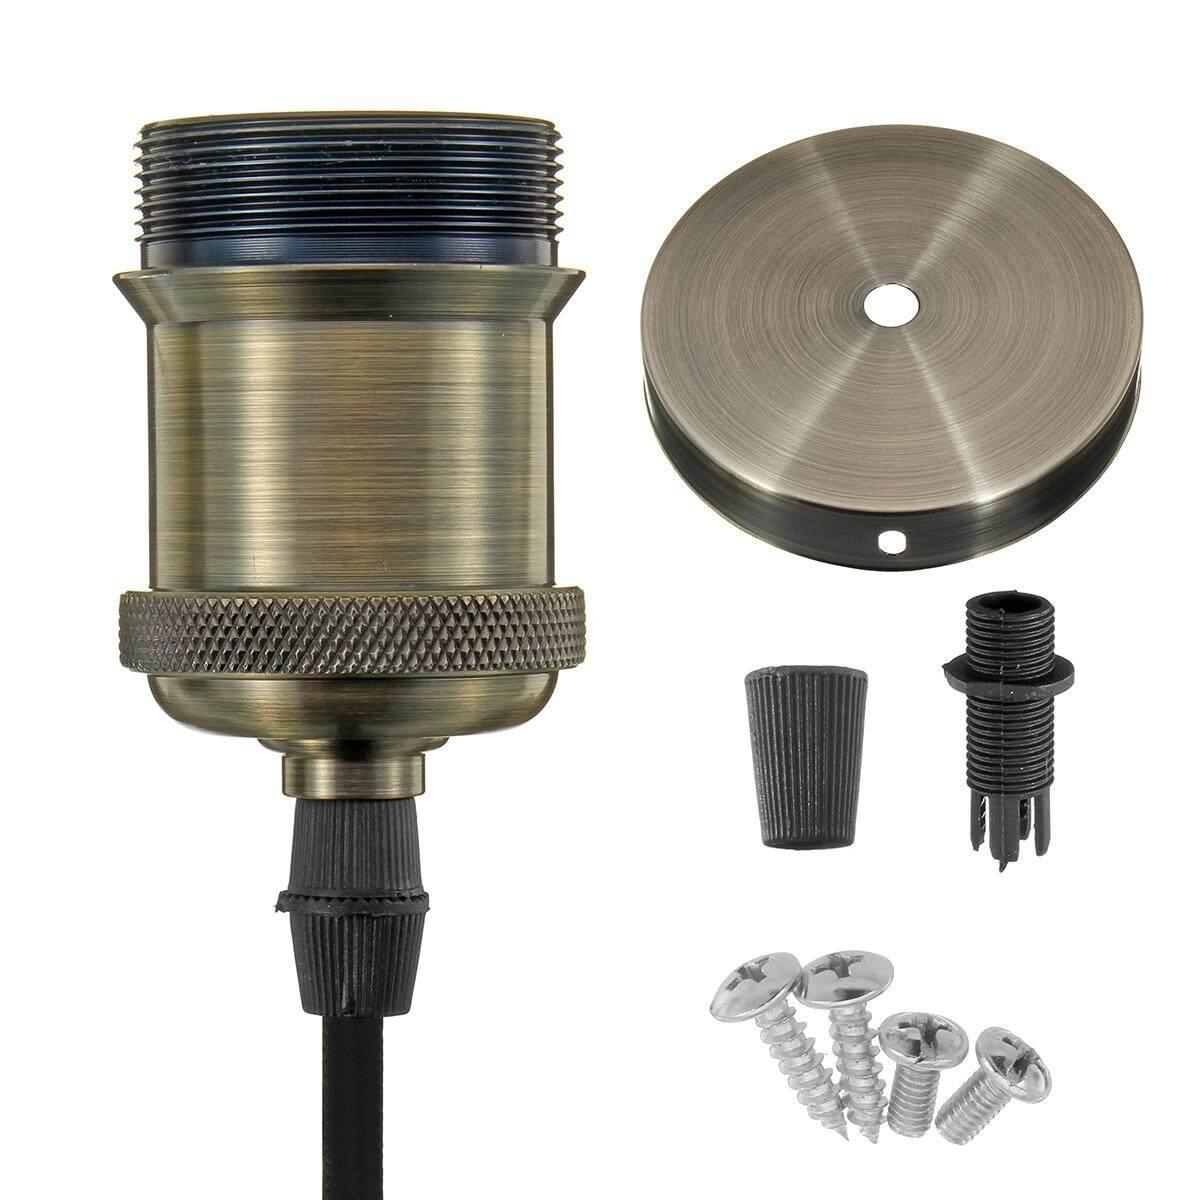 E27 Base Light Lamp Holder Vintage Pendant Industrial Copper